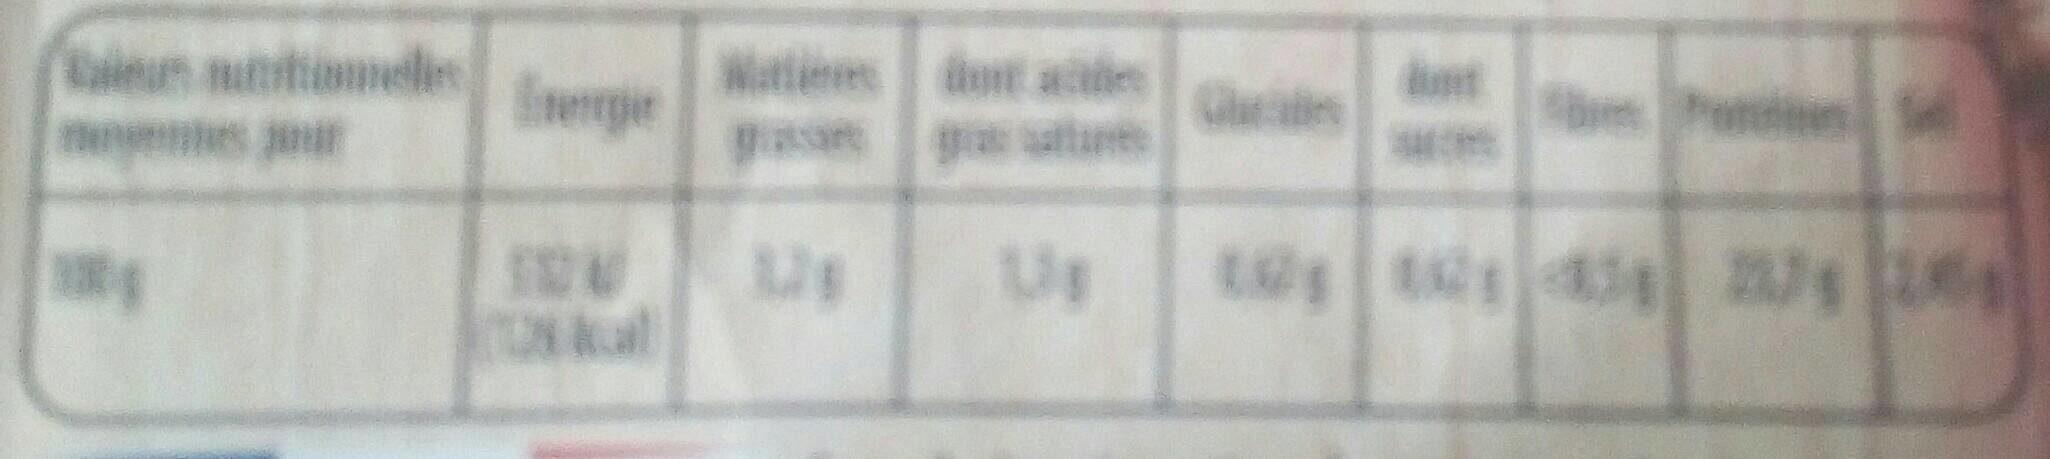 Rôti de porc - Informazioni nutrizionali - fr